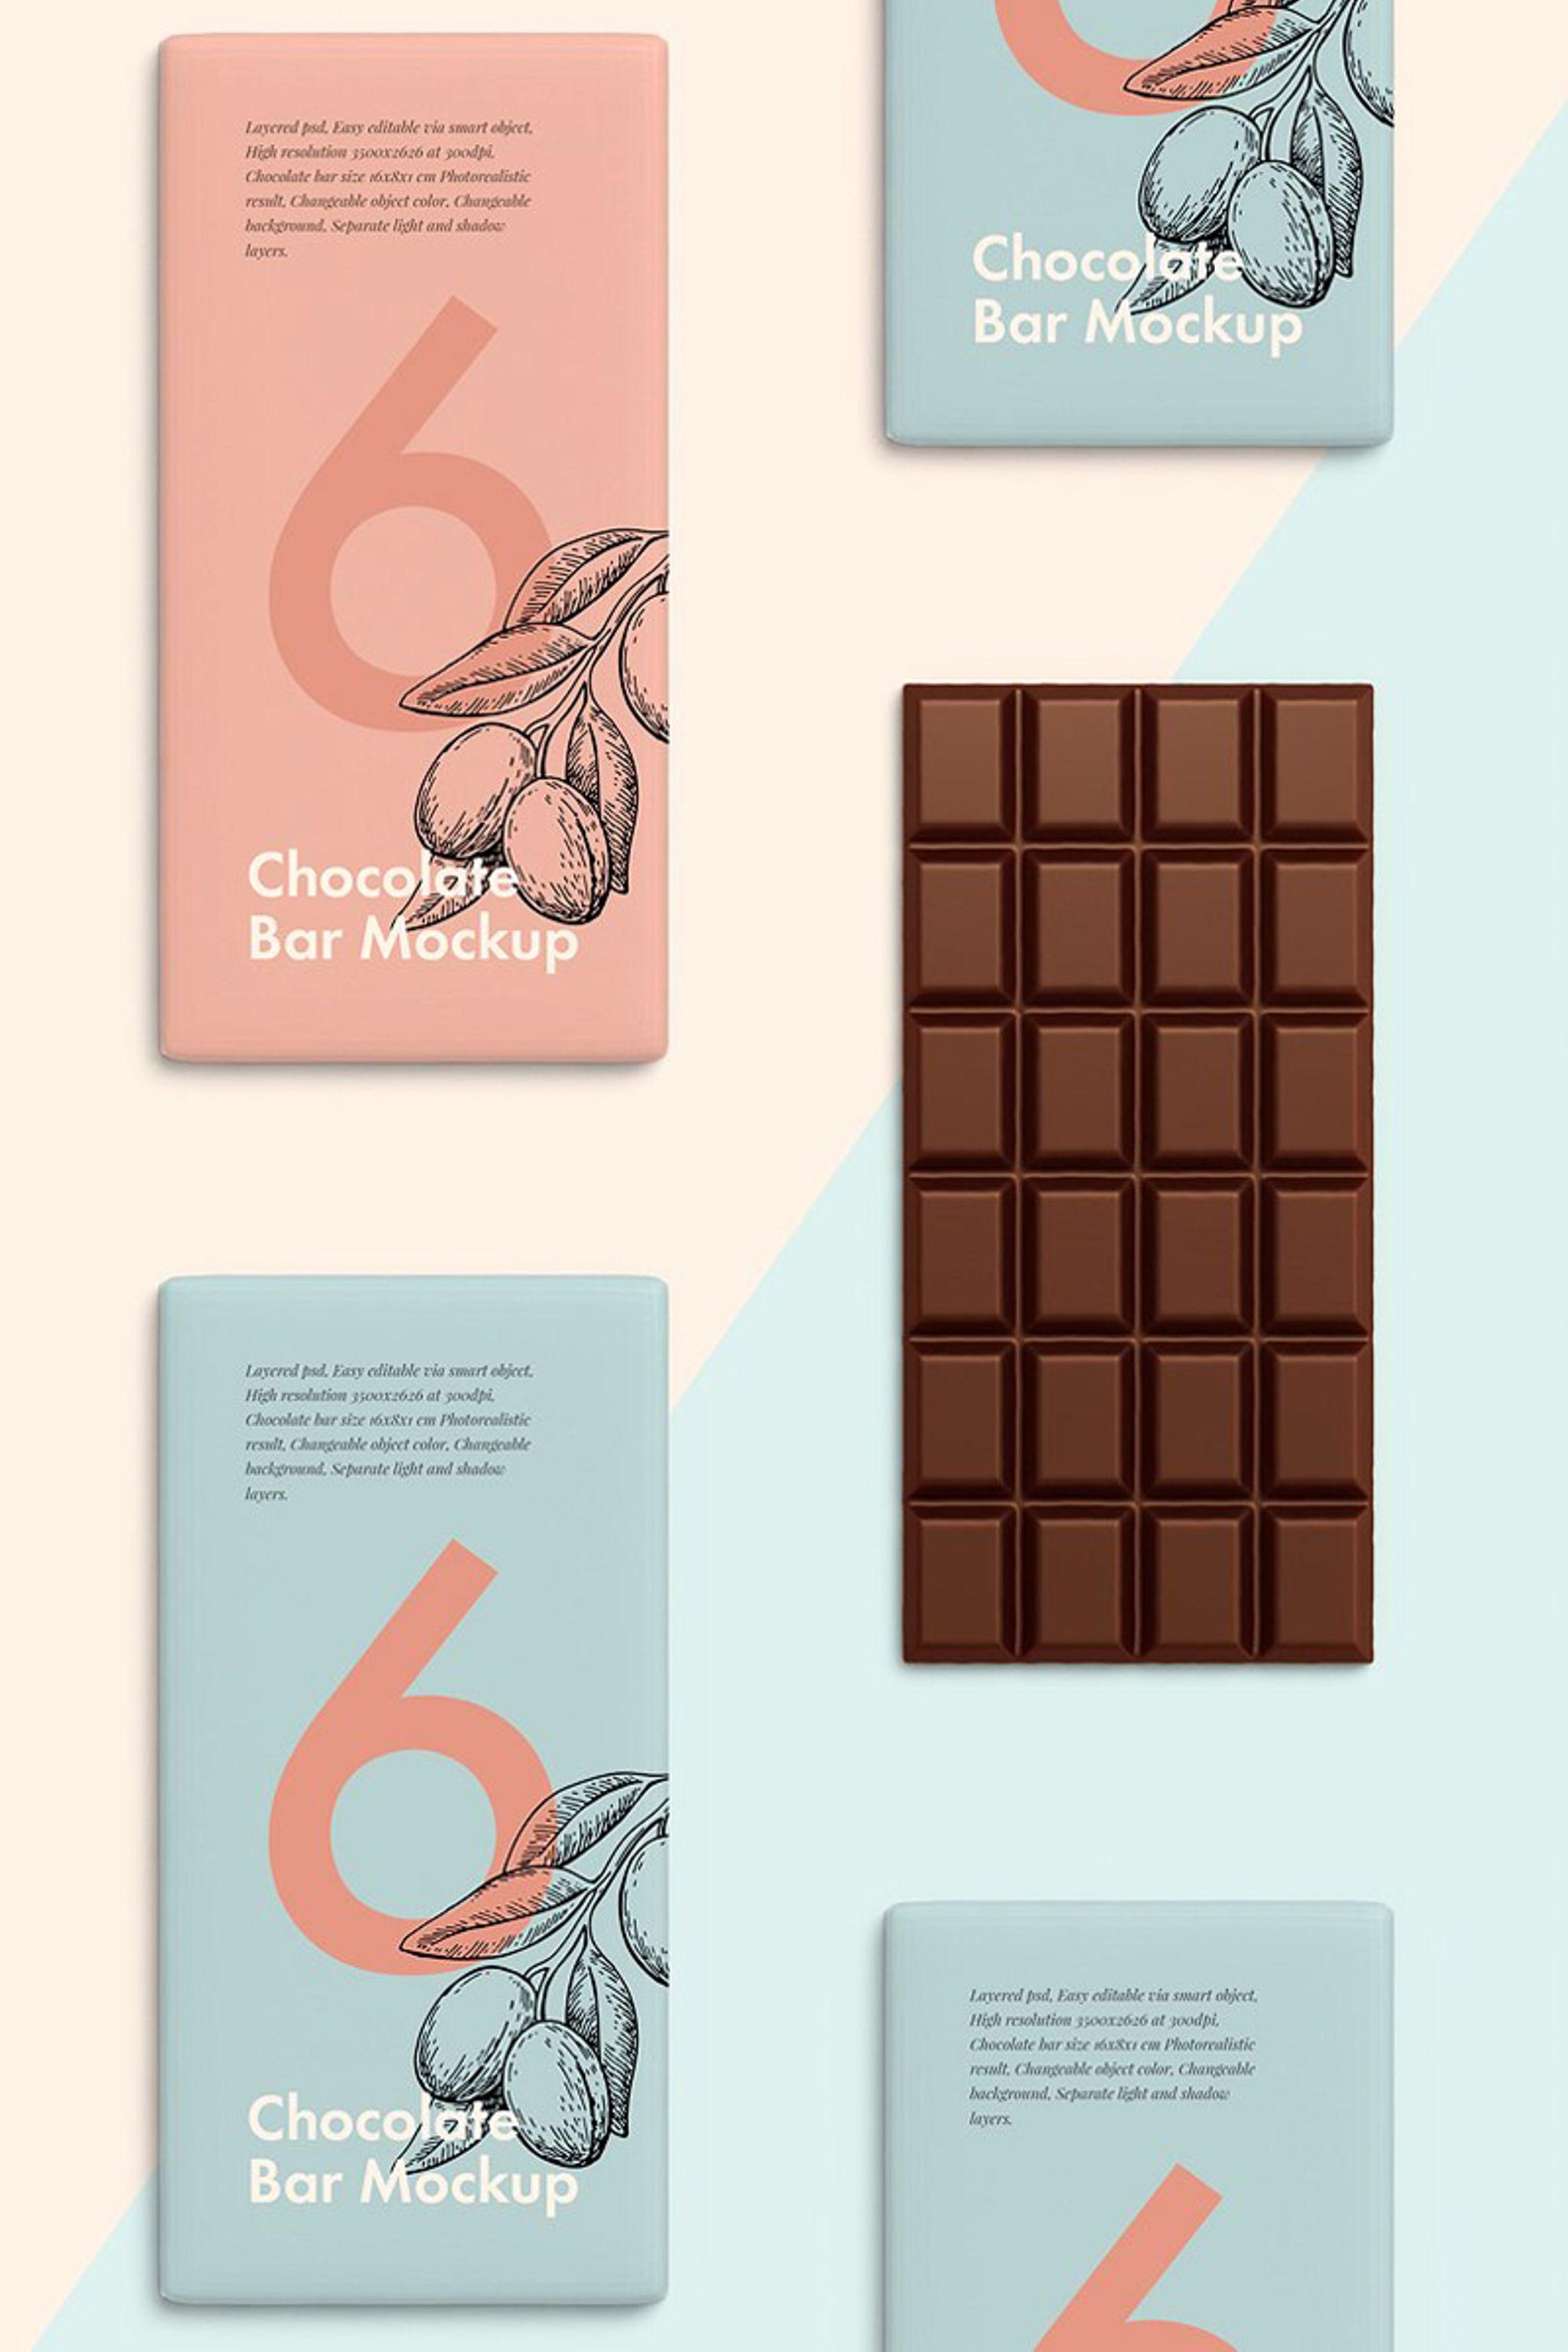 Chocolate Bar Product Mockup